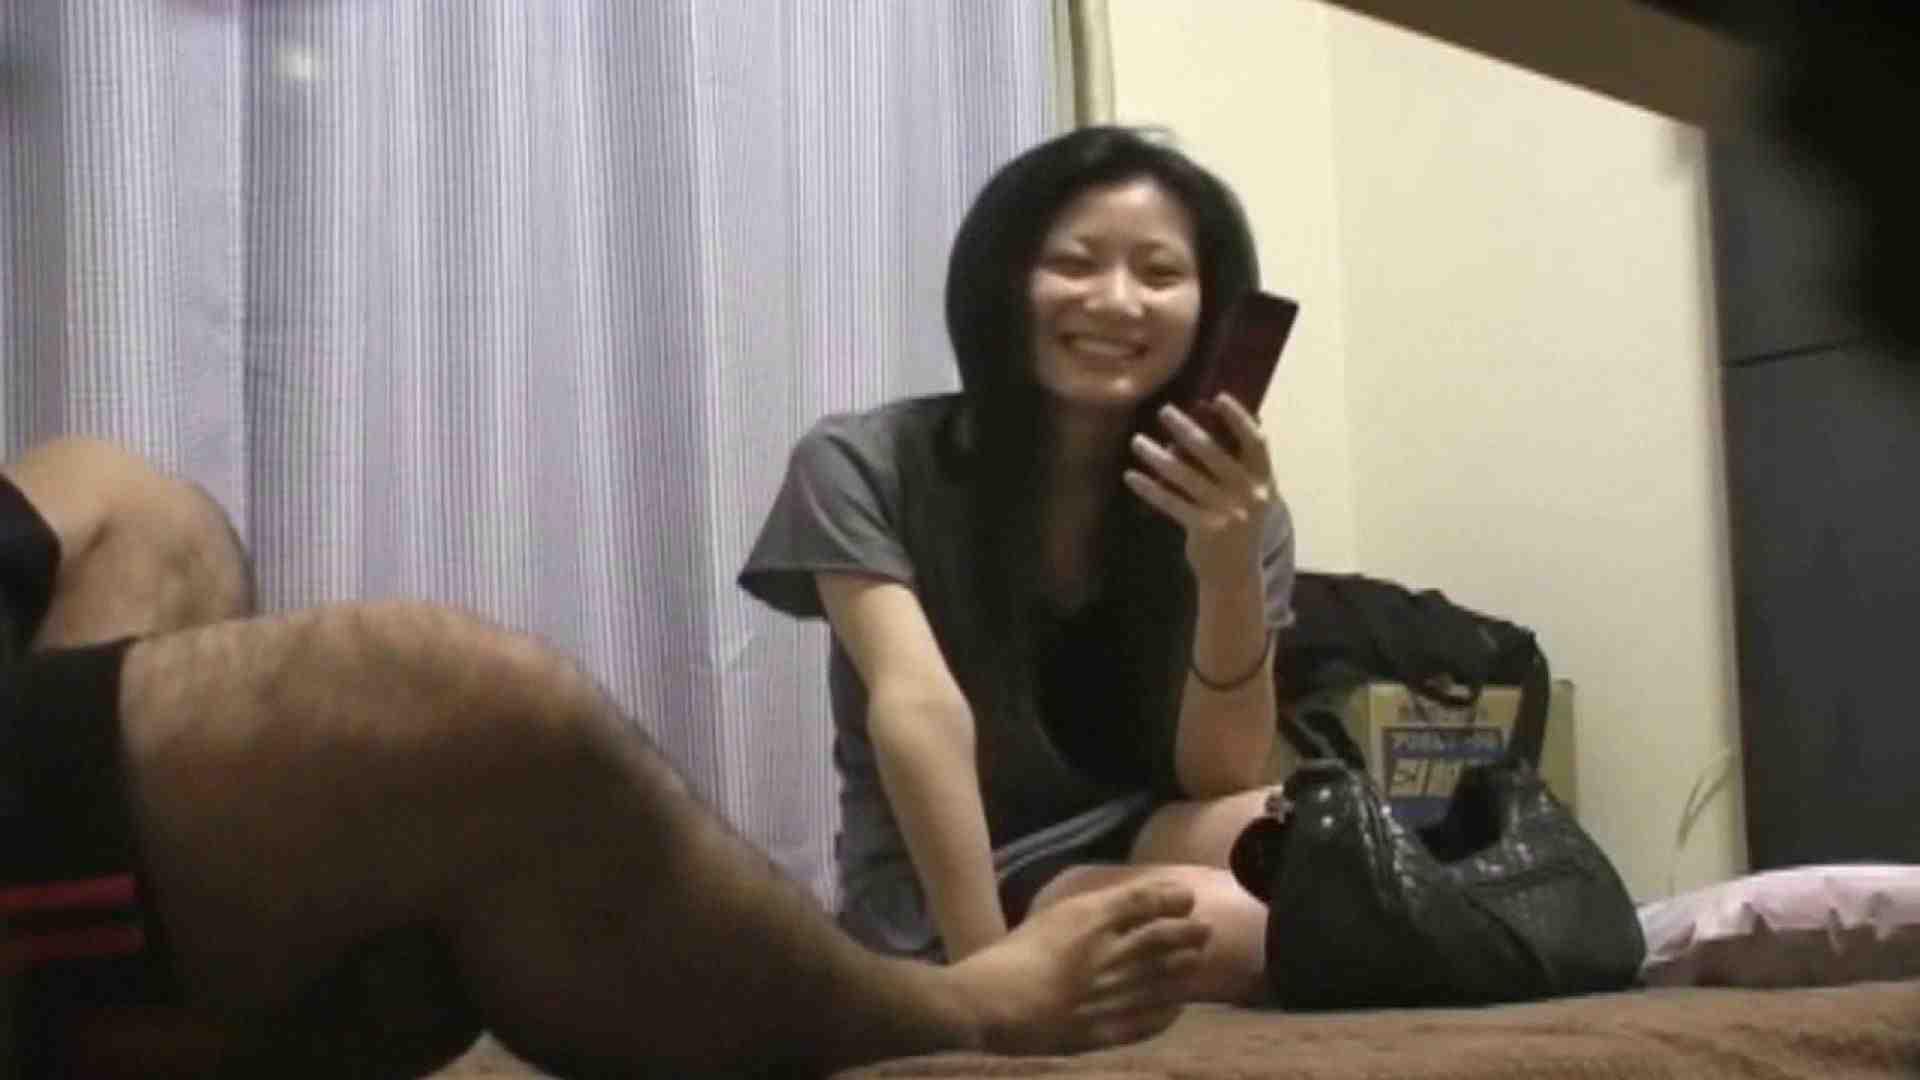 S級厳選美女ビッチガールVol.13 OLセックス   美女ヌード  83画像 3